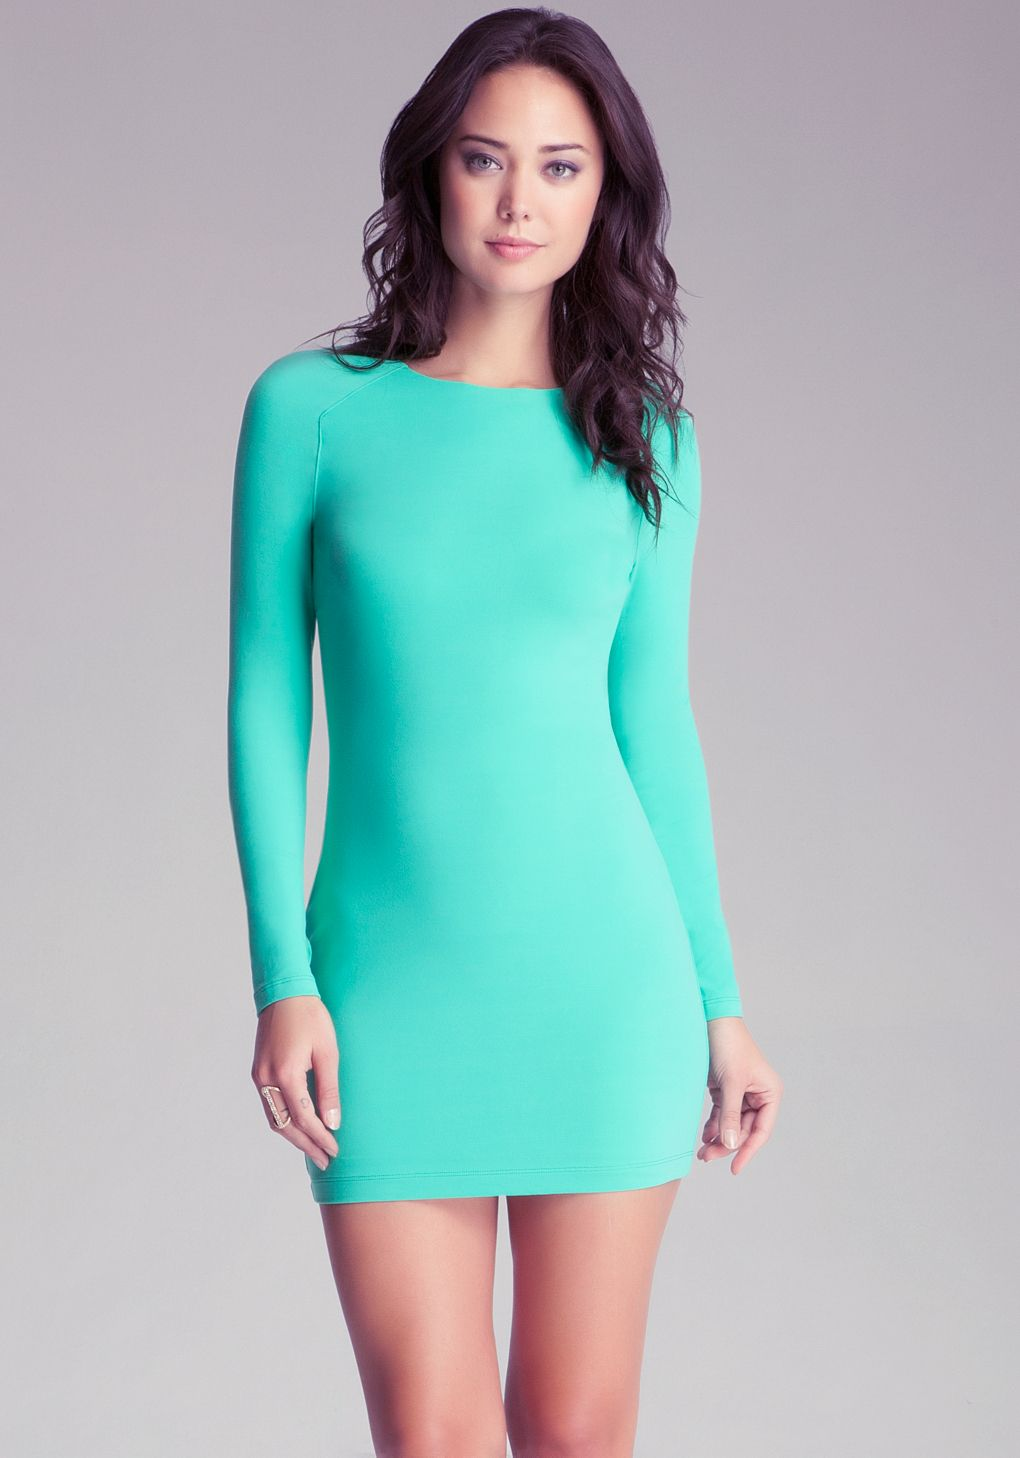 Bebe Green Long Sleeve Bodycon Dress | Bodycon Dresses | Pinterest ...